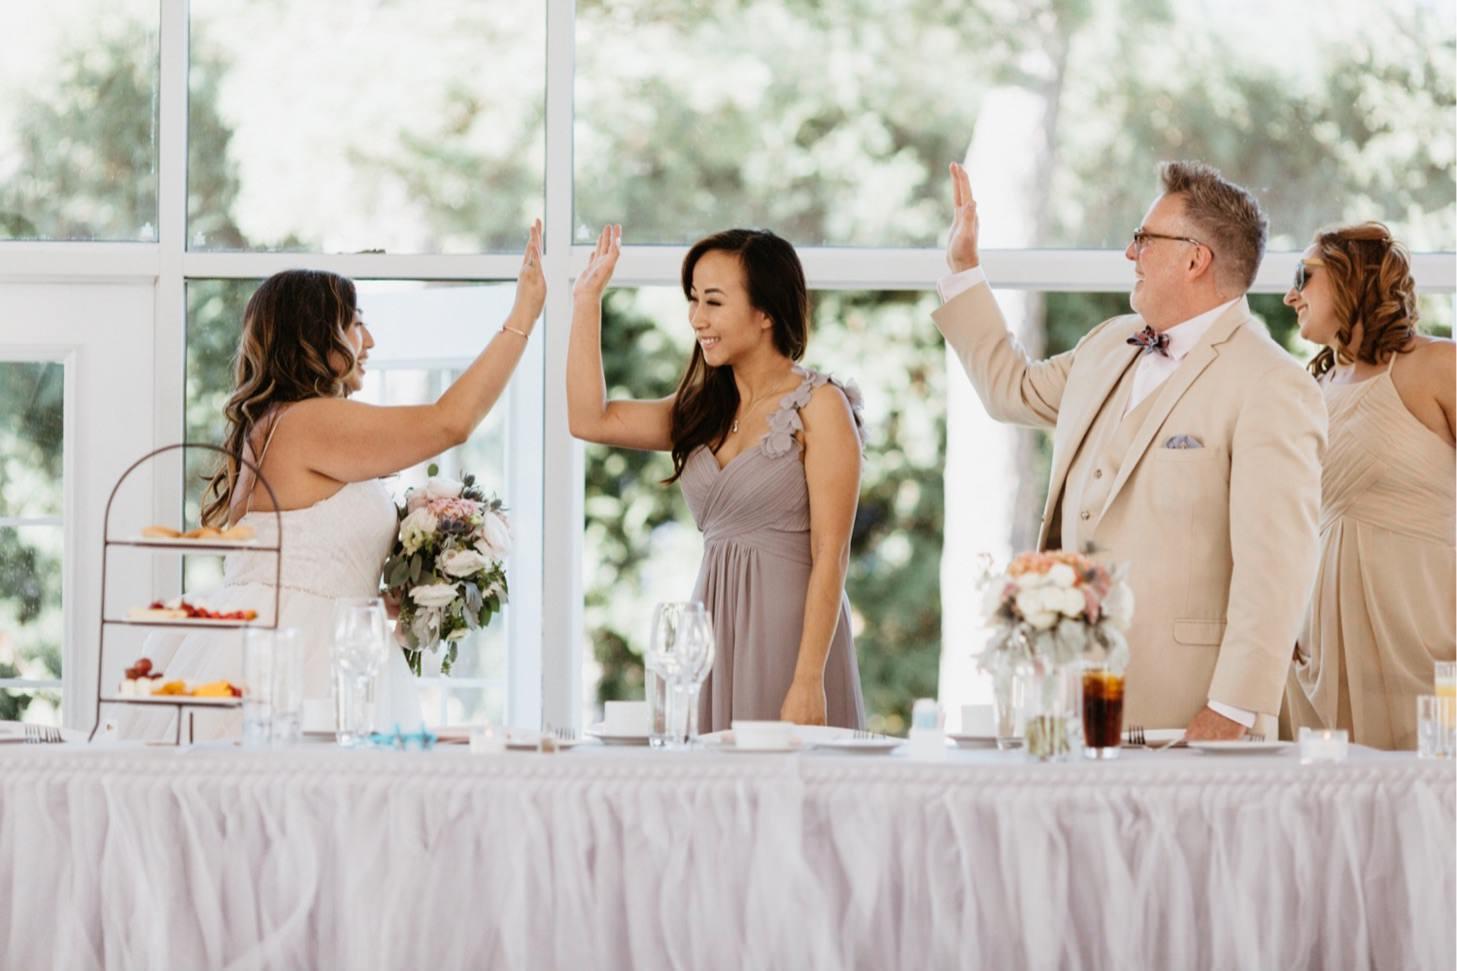 ritz-charles-wedding-reception-downtown-indianapolis-wedding-photographer027.JPG